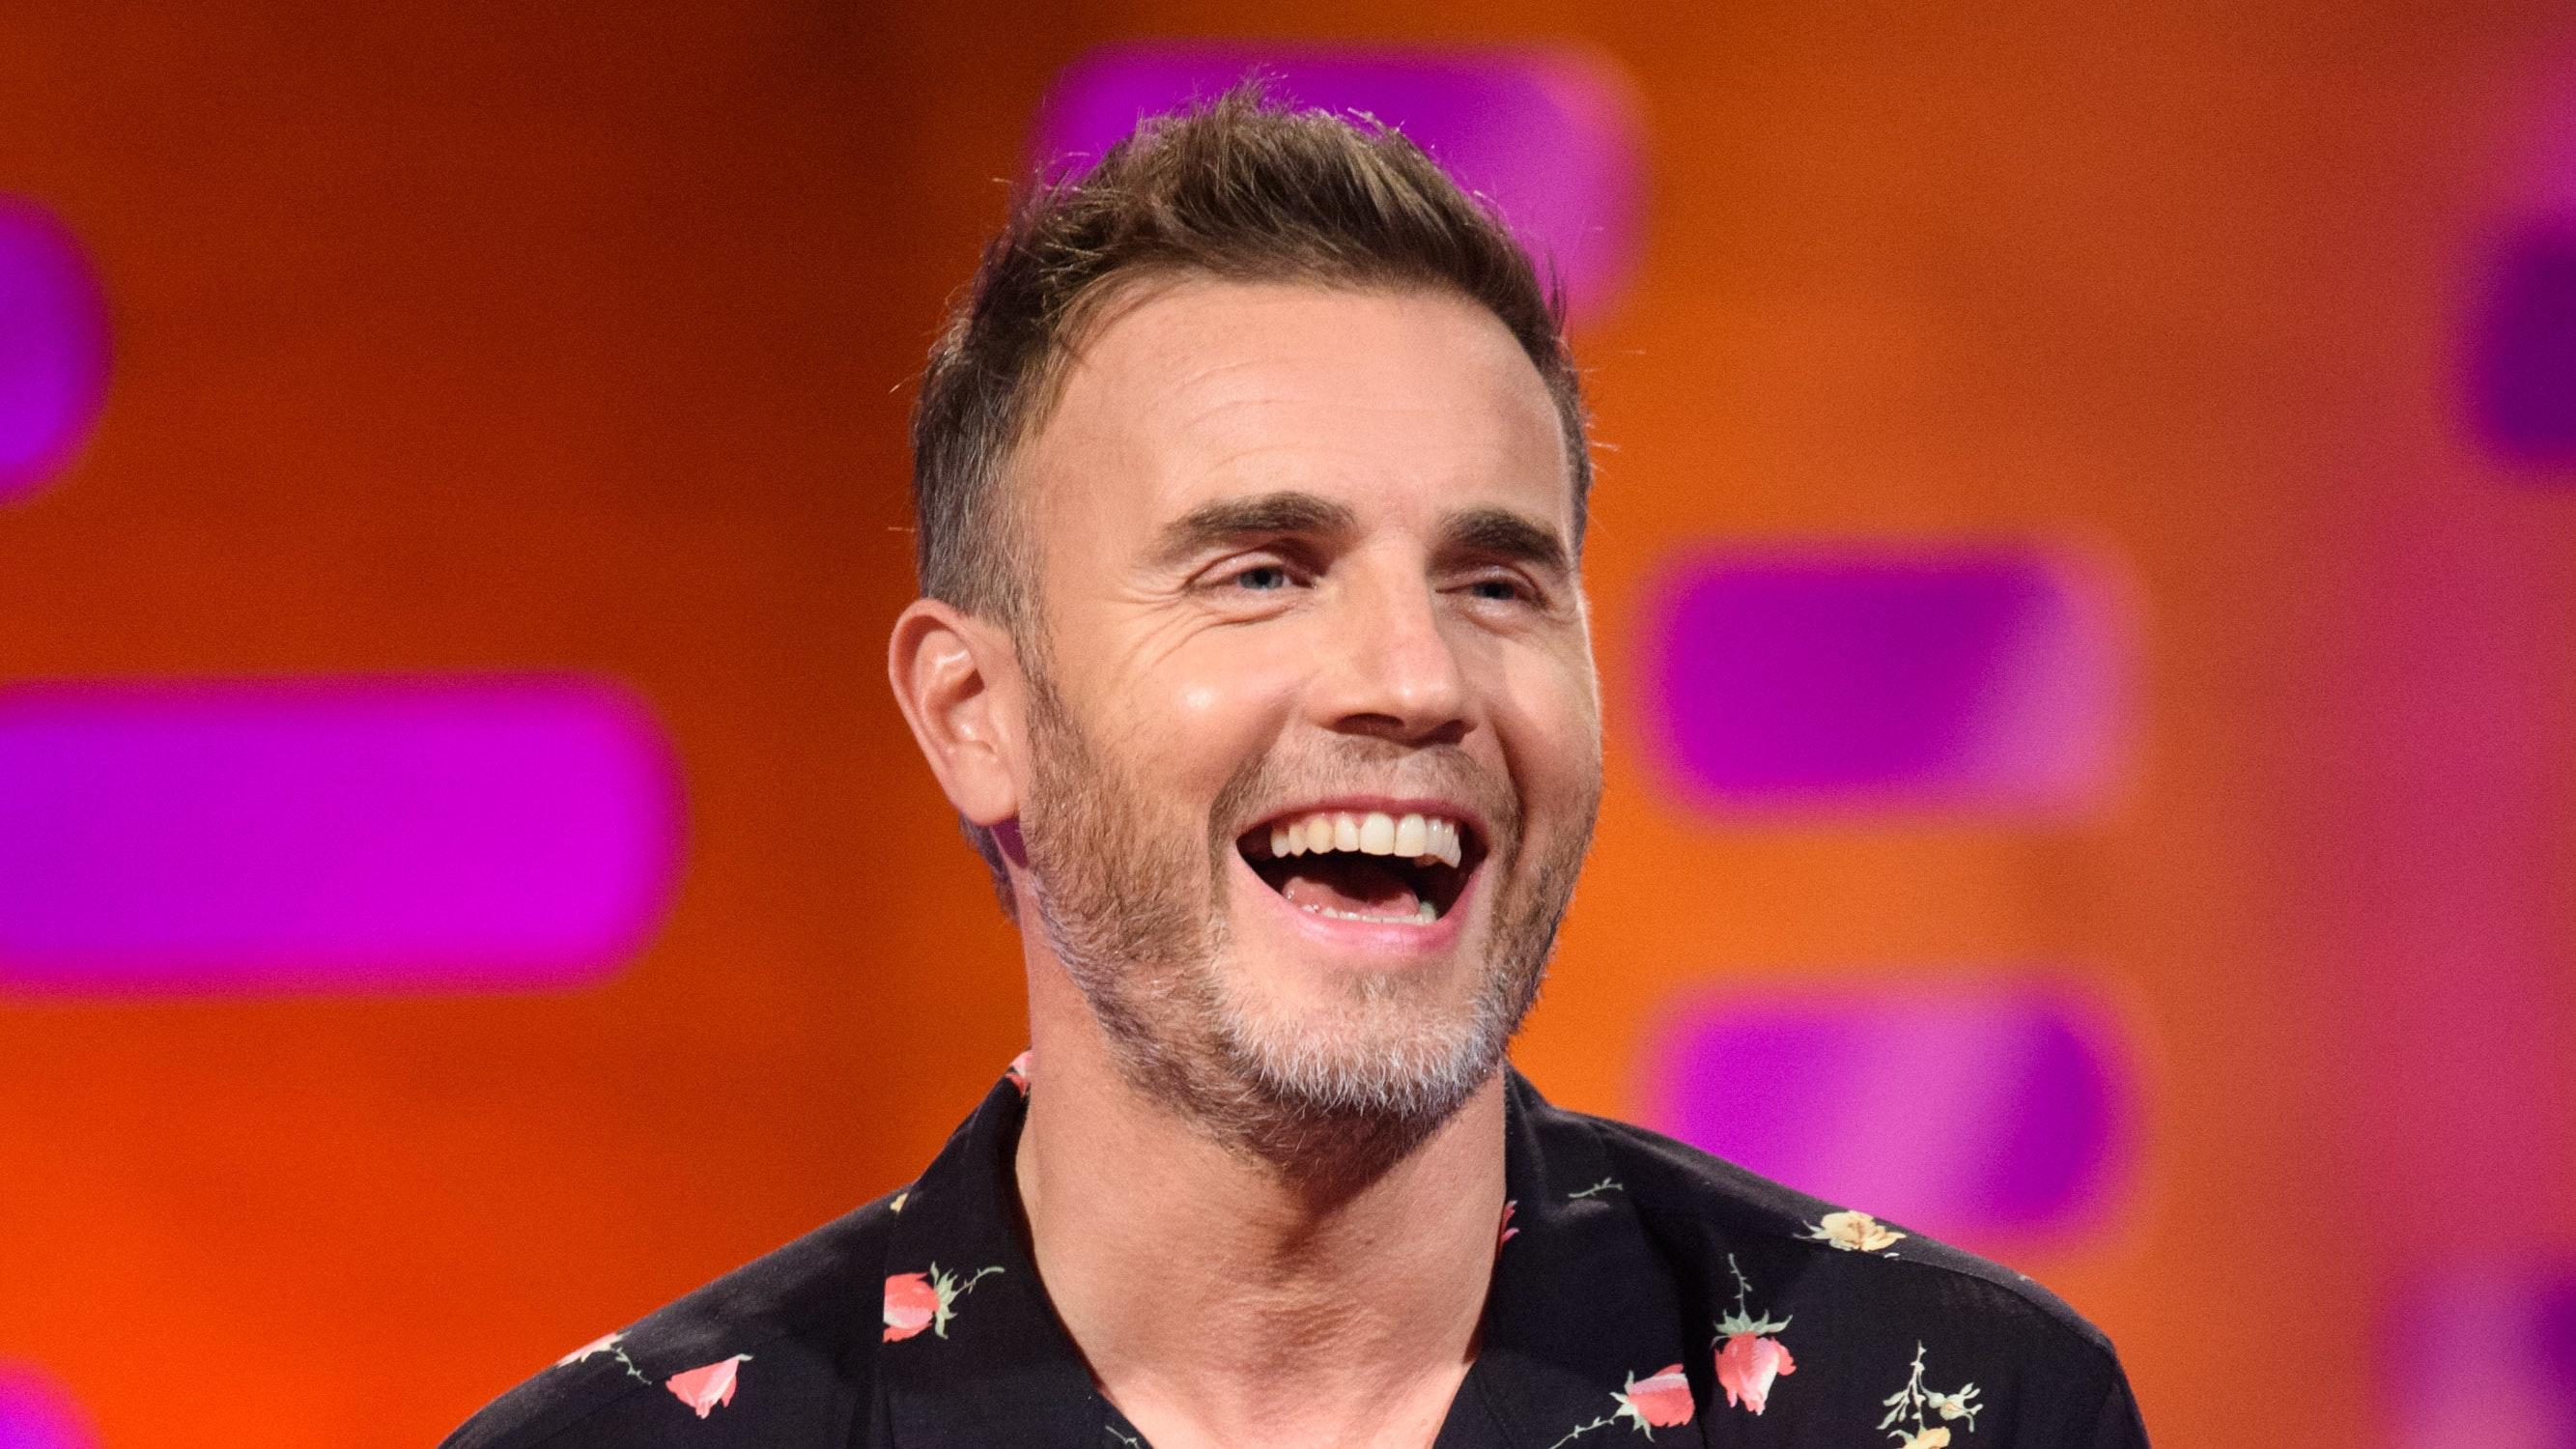 Watch Gary Barlow's Surprising New Blockbuster Film Role video